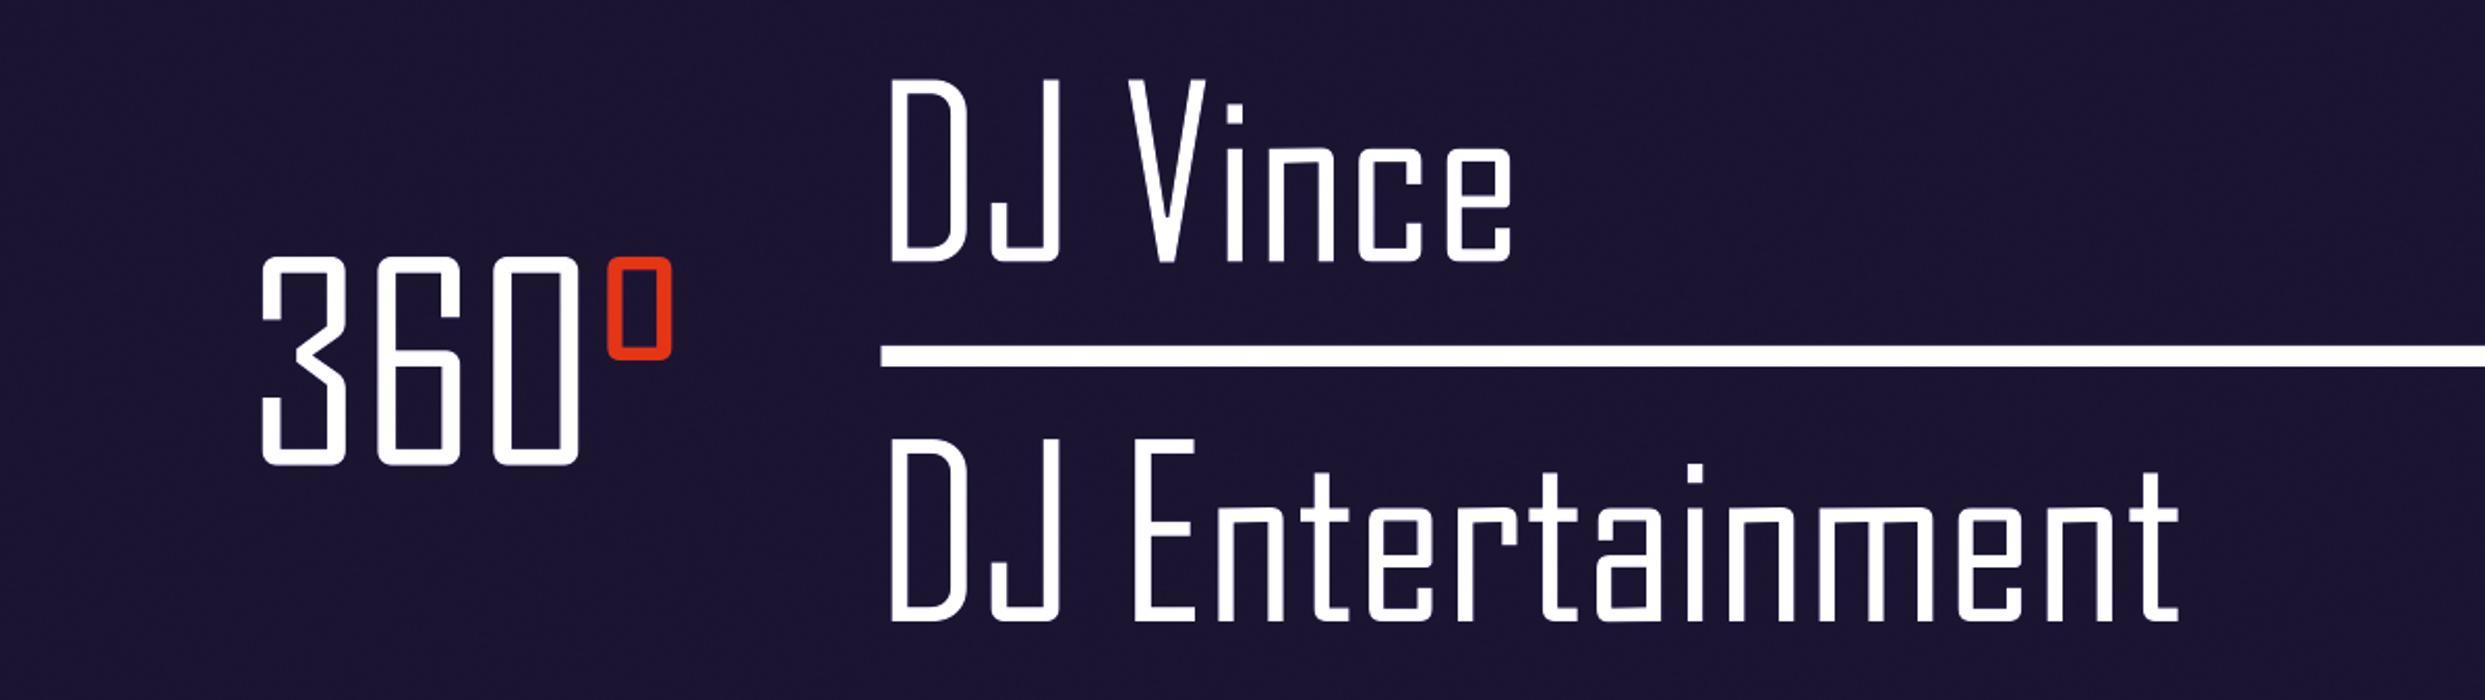 Bild zu DJ Vince 380° in Düsseldorf